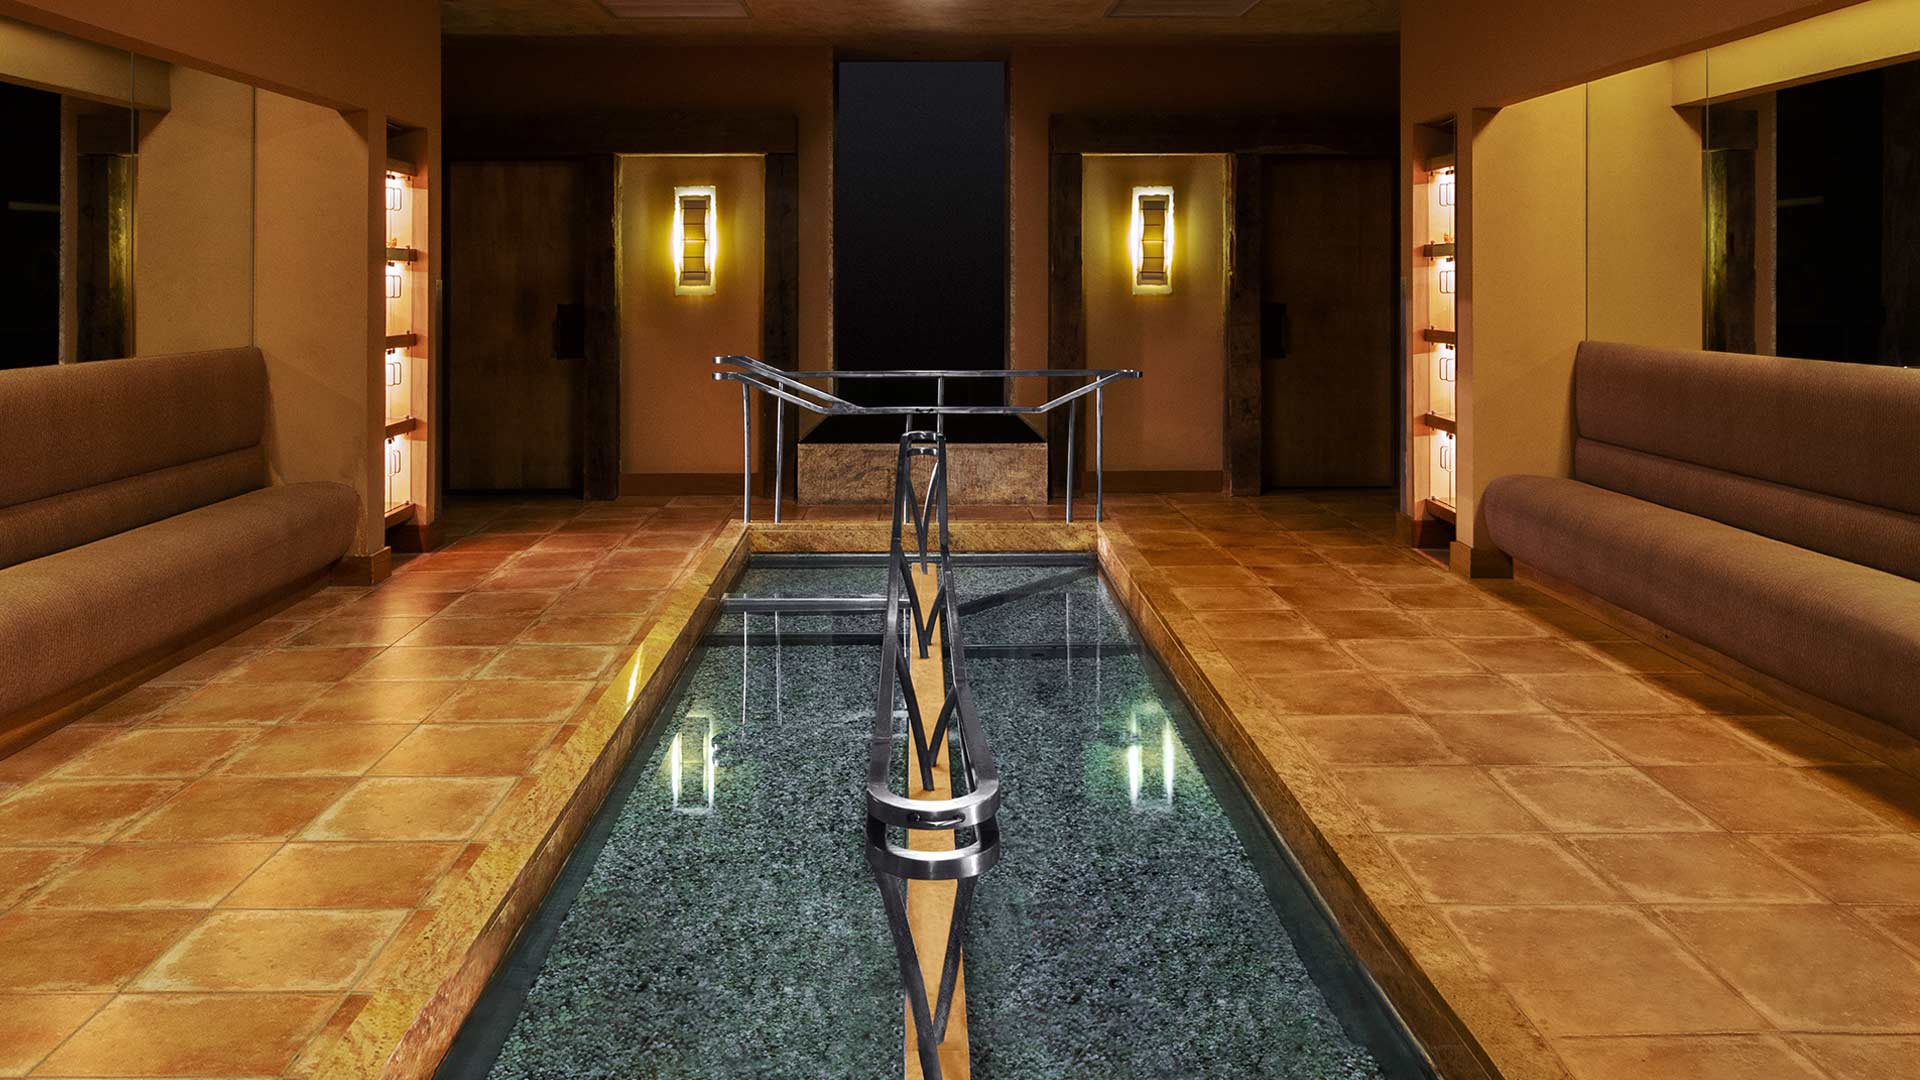 dark, warming interiors surround a thin, long dipping pool